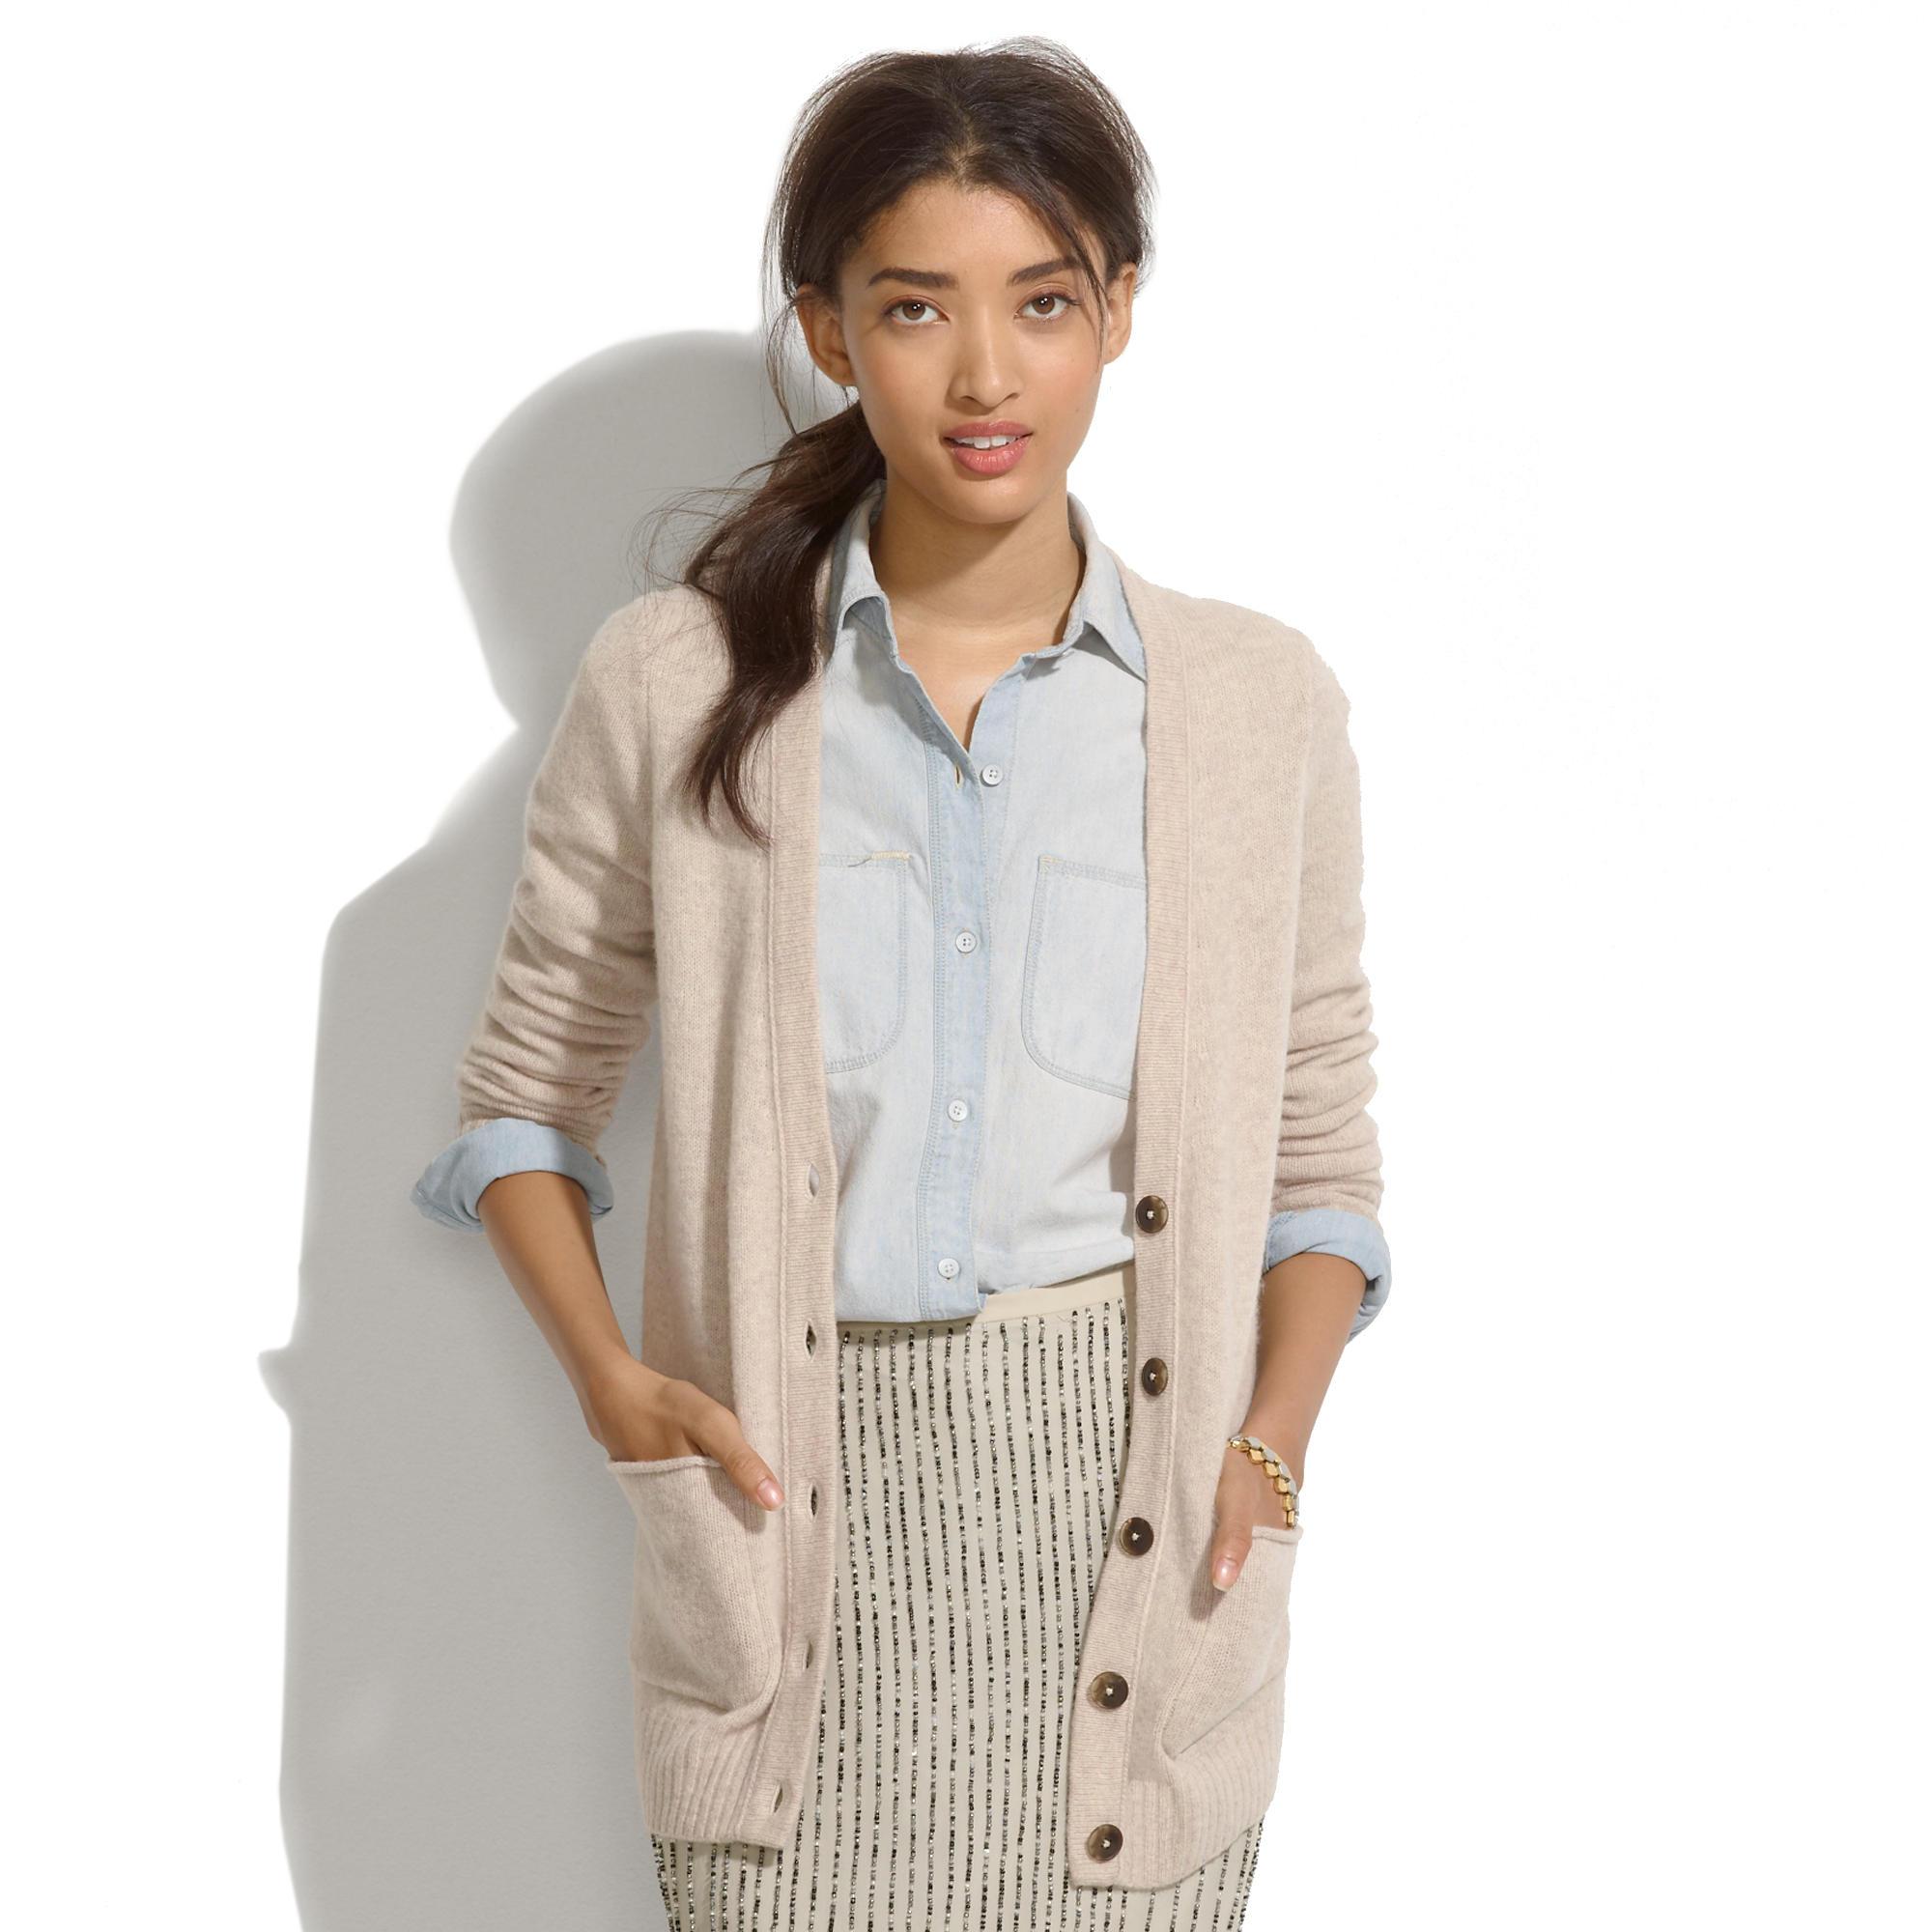 Coffeeshop Cardigan : cardigans & sweater-jackets | Madewell